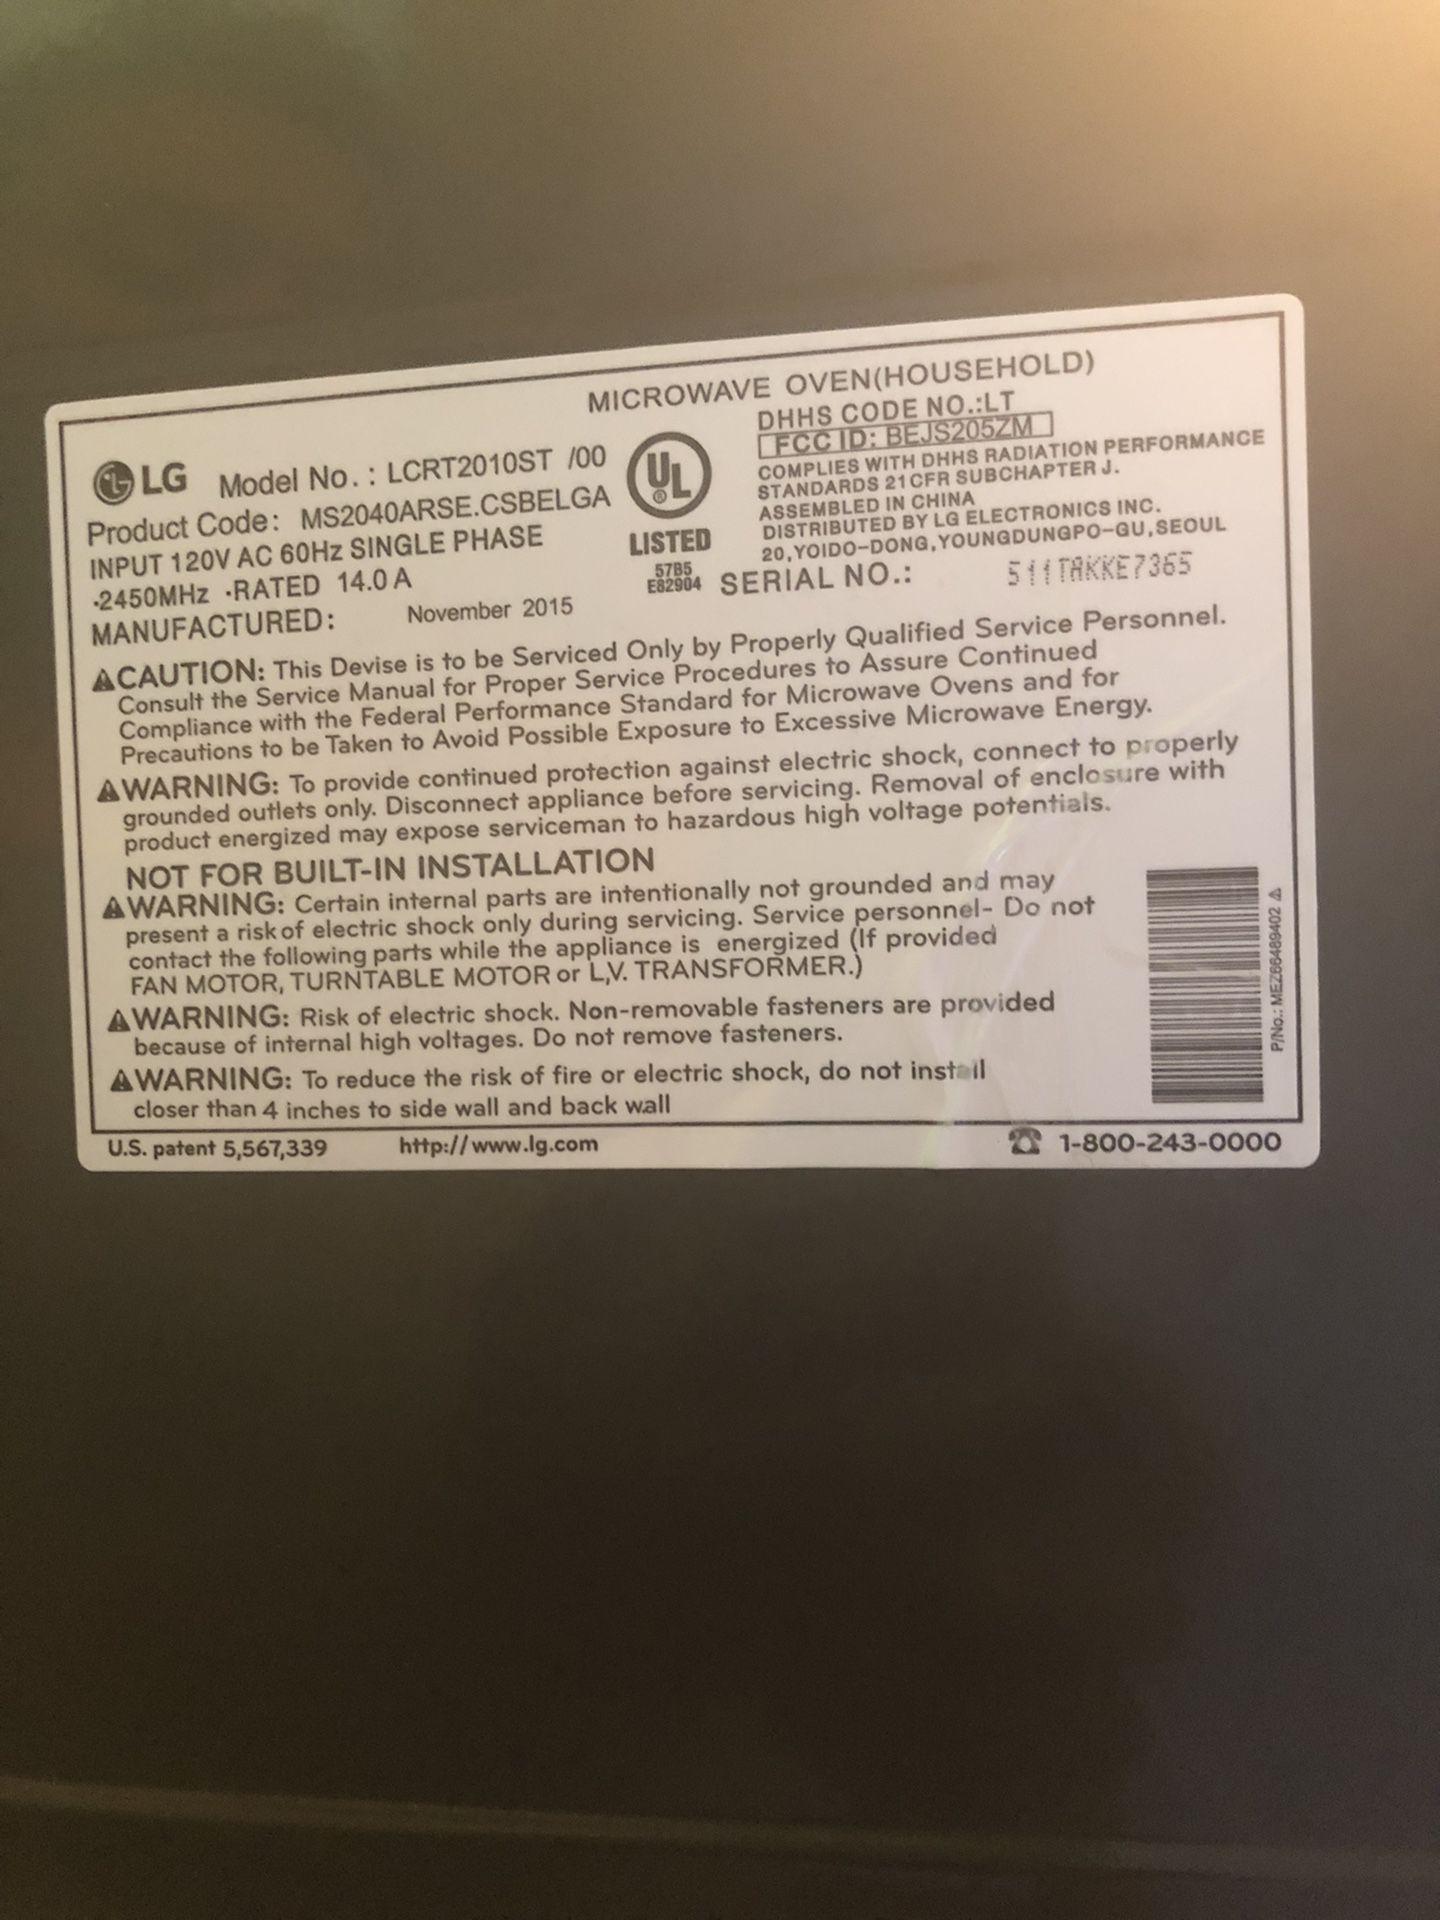 LG Microwave Stainless Steel 1,200 Watts.